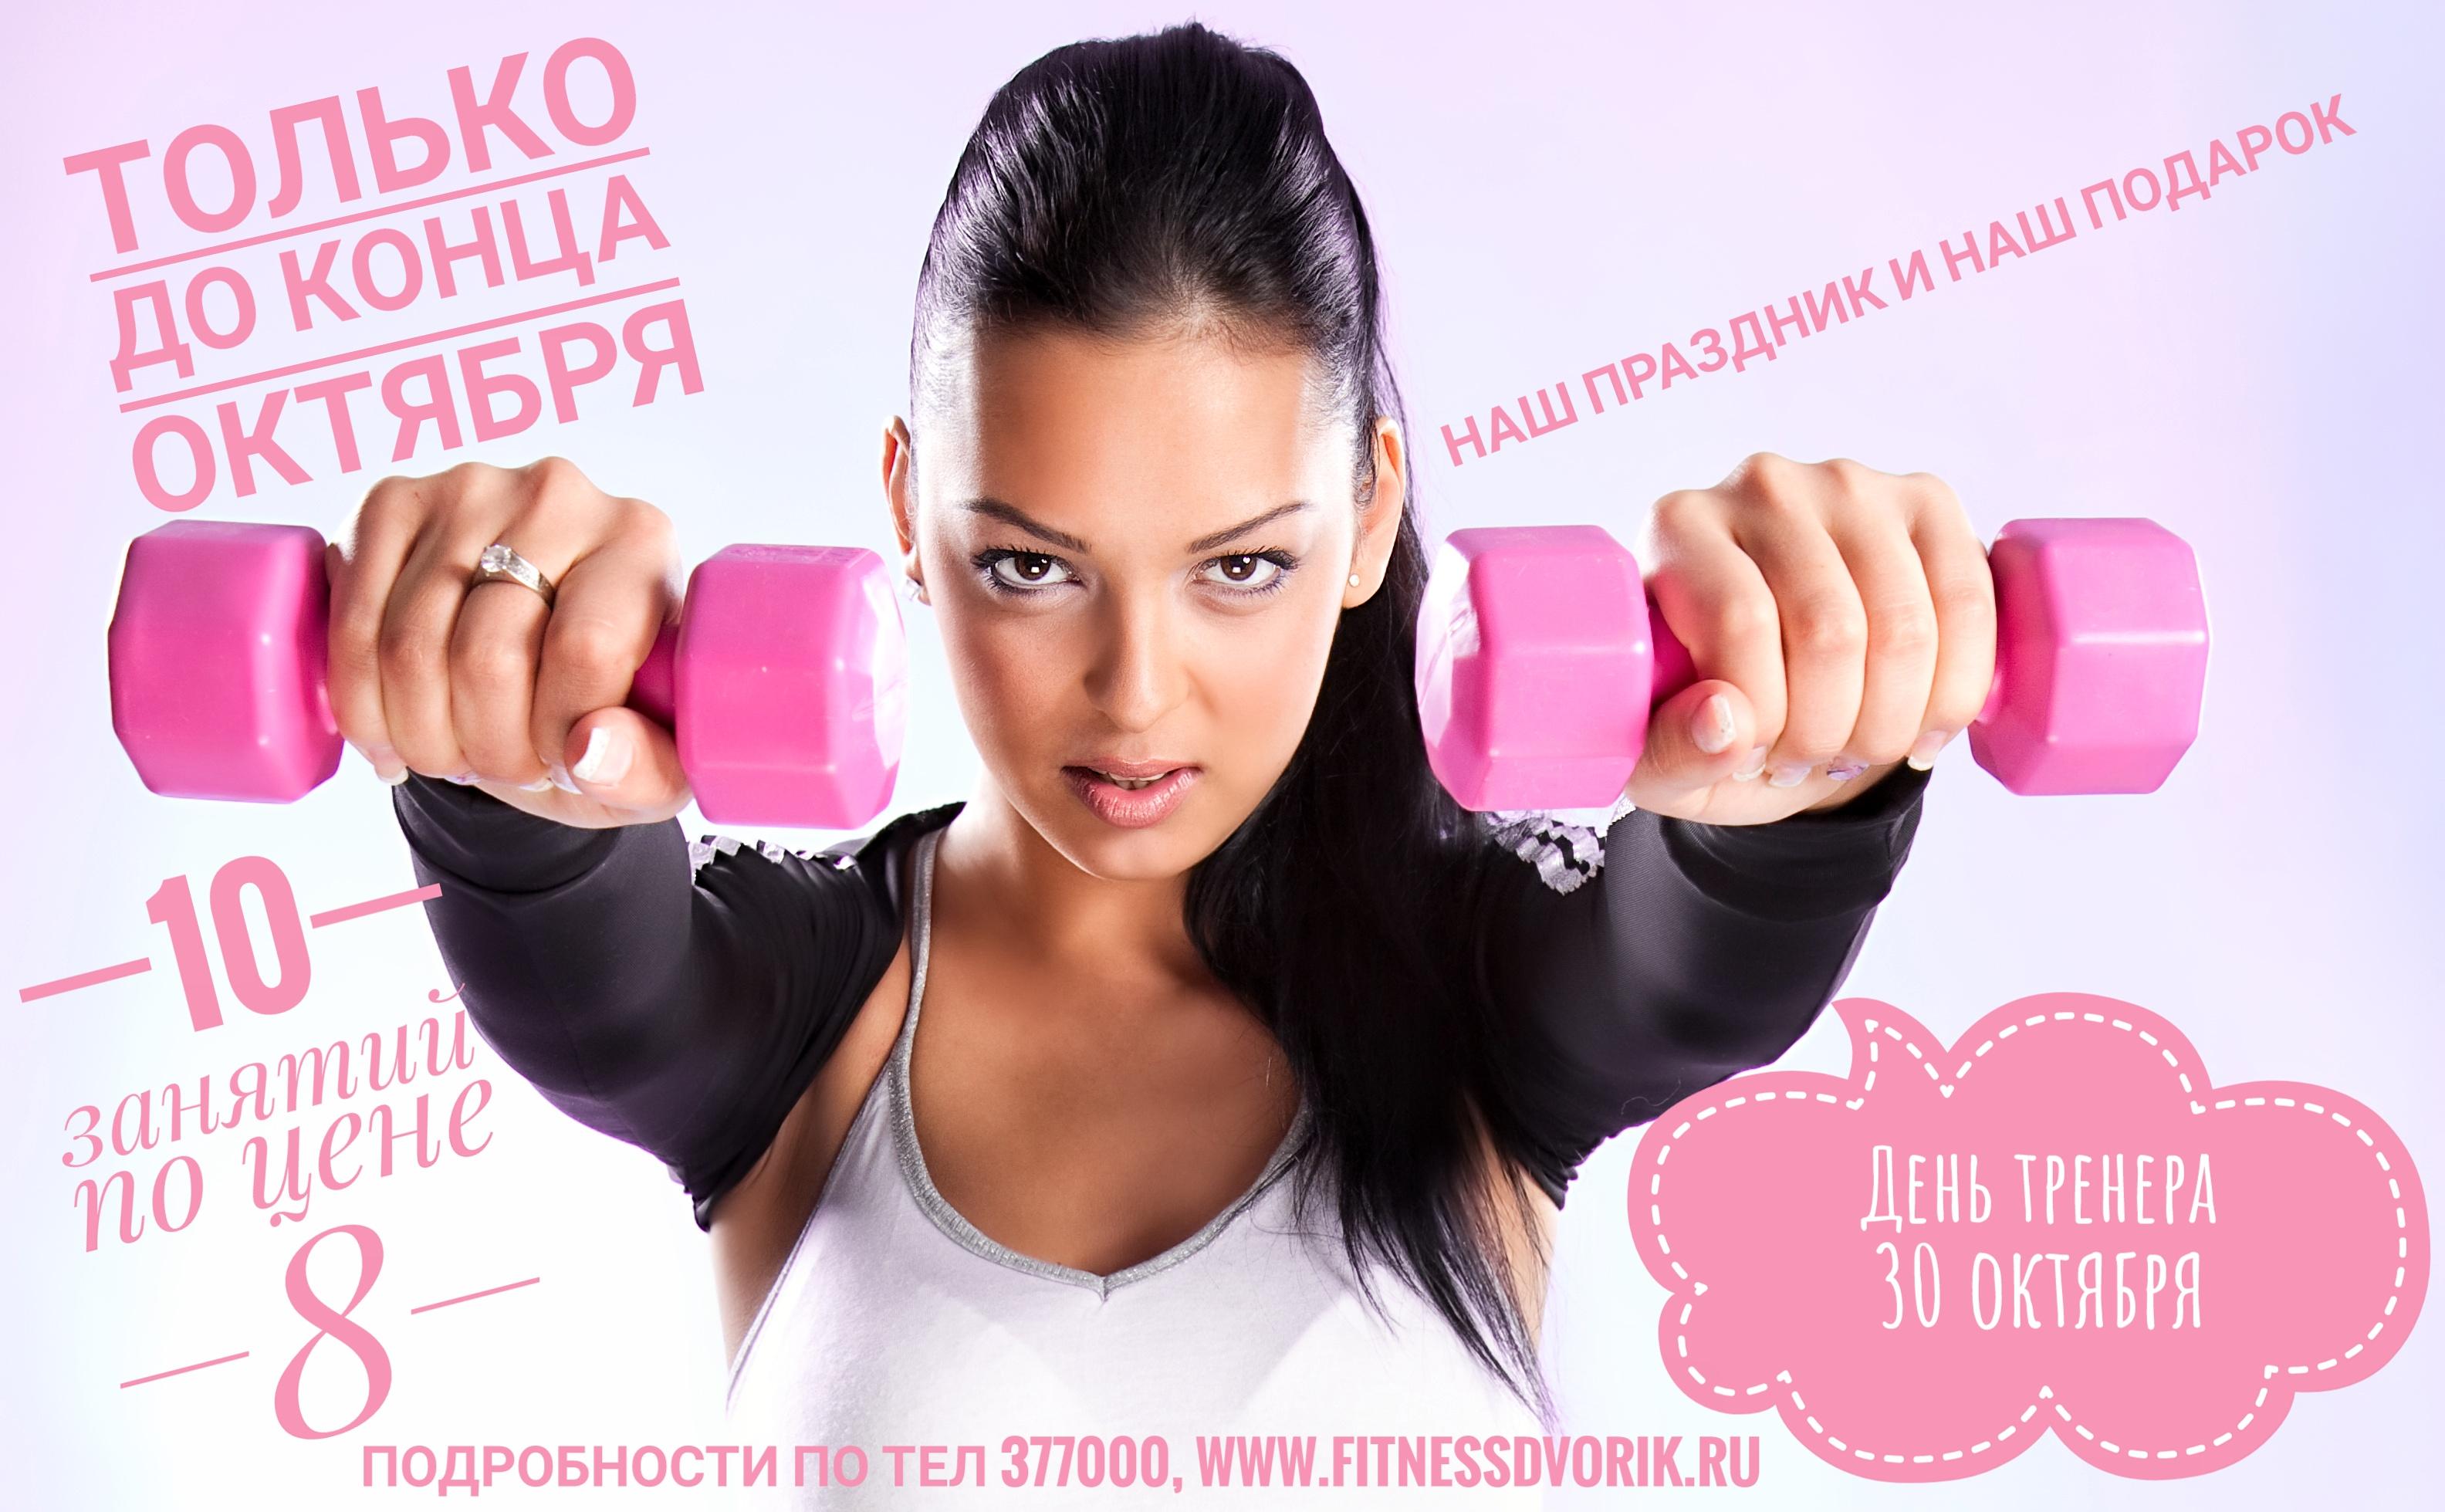 fitness-woman-dumbbells-01